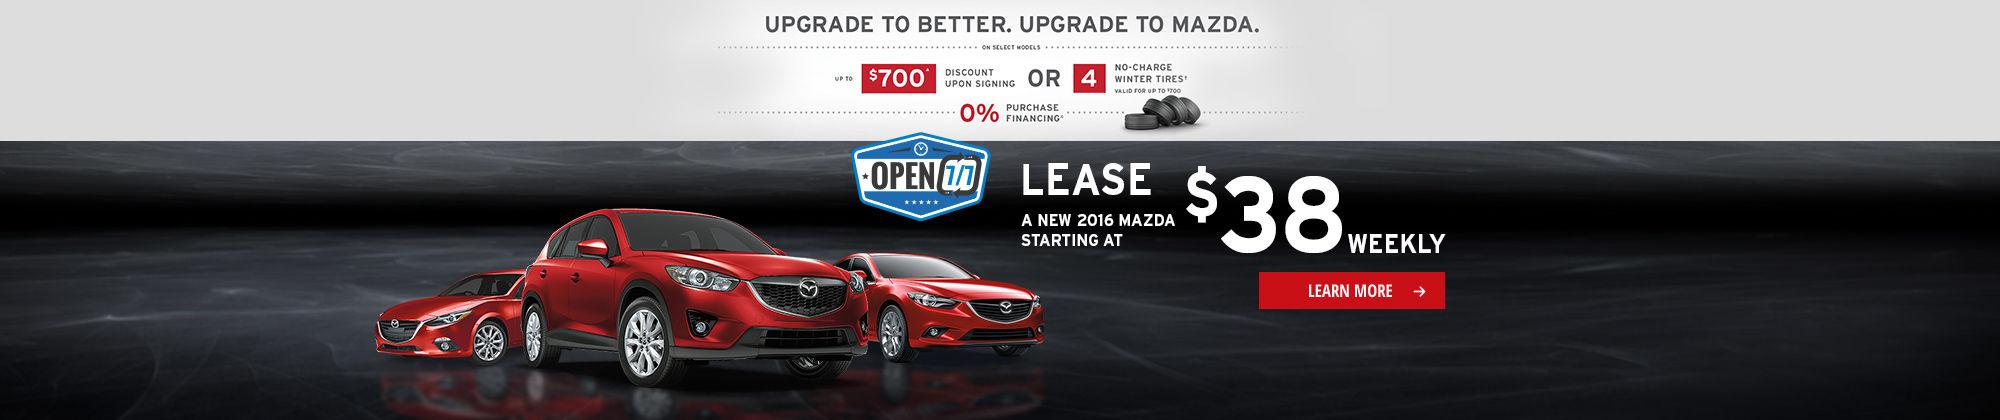 Upgrade To Better. Upgrade To Mazda